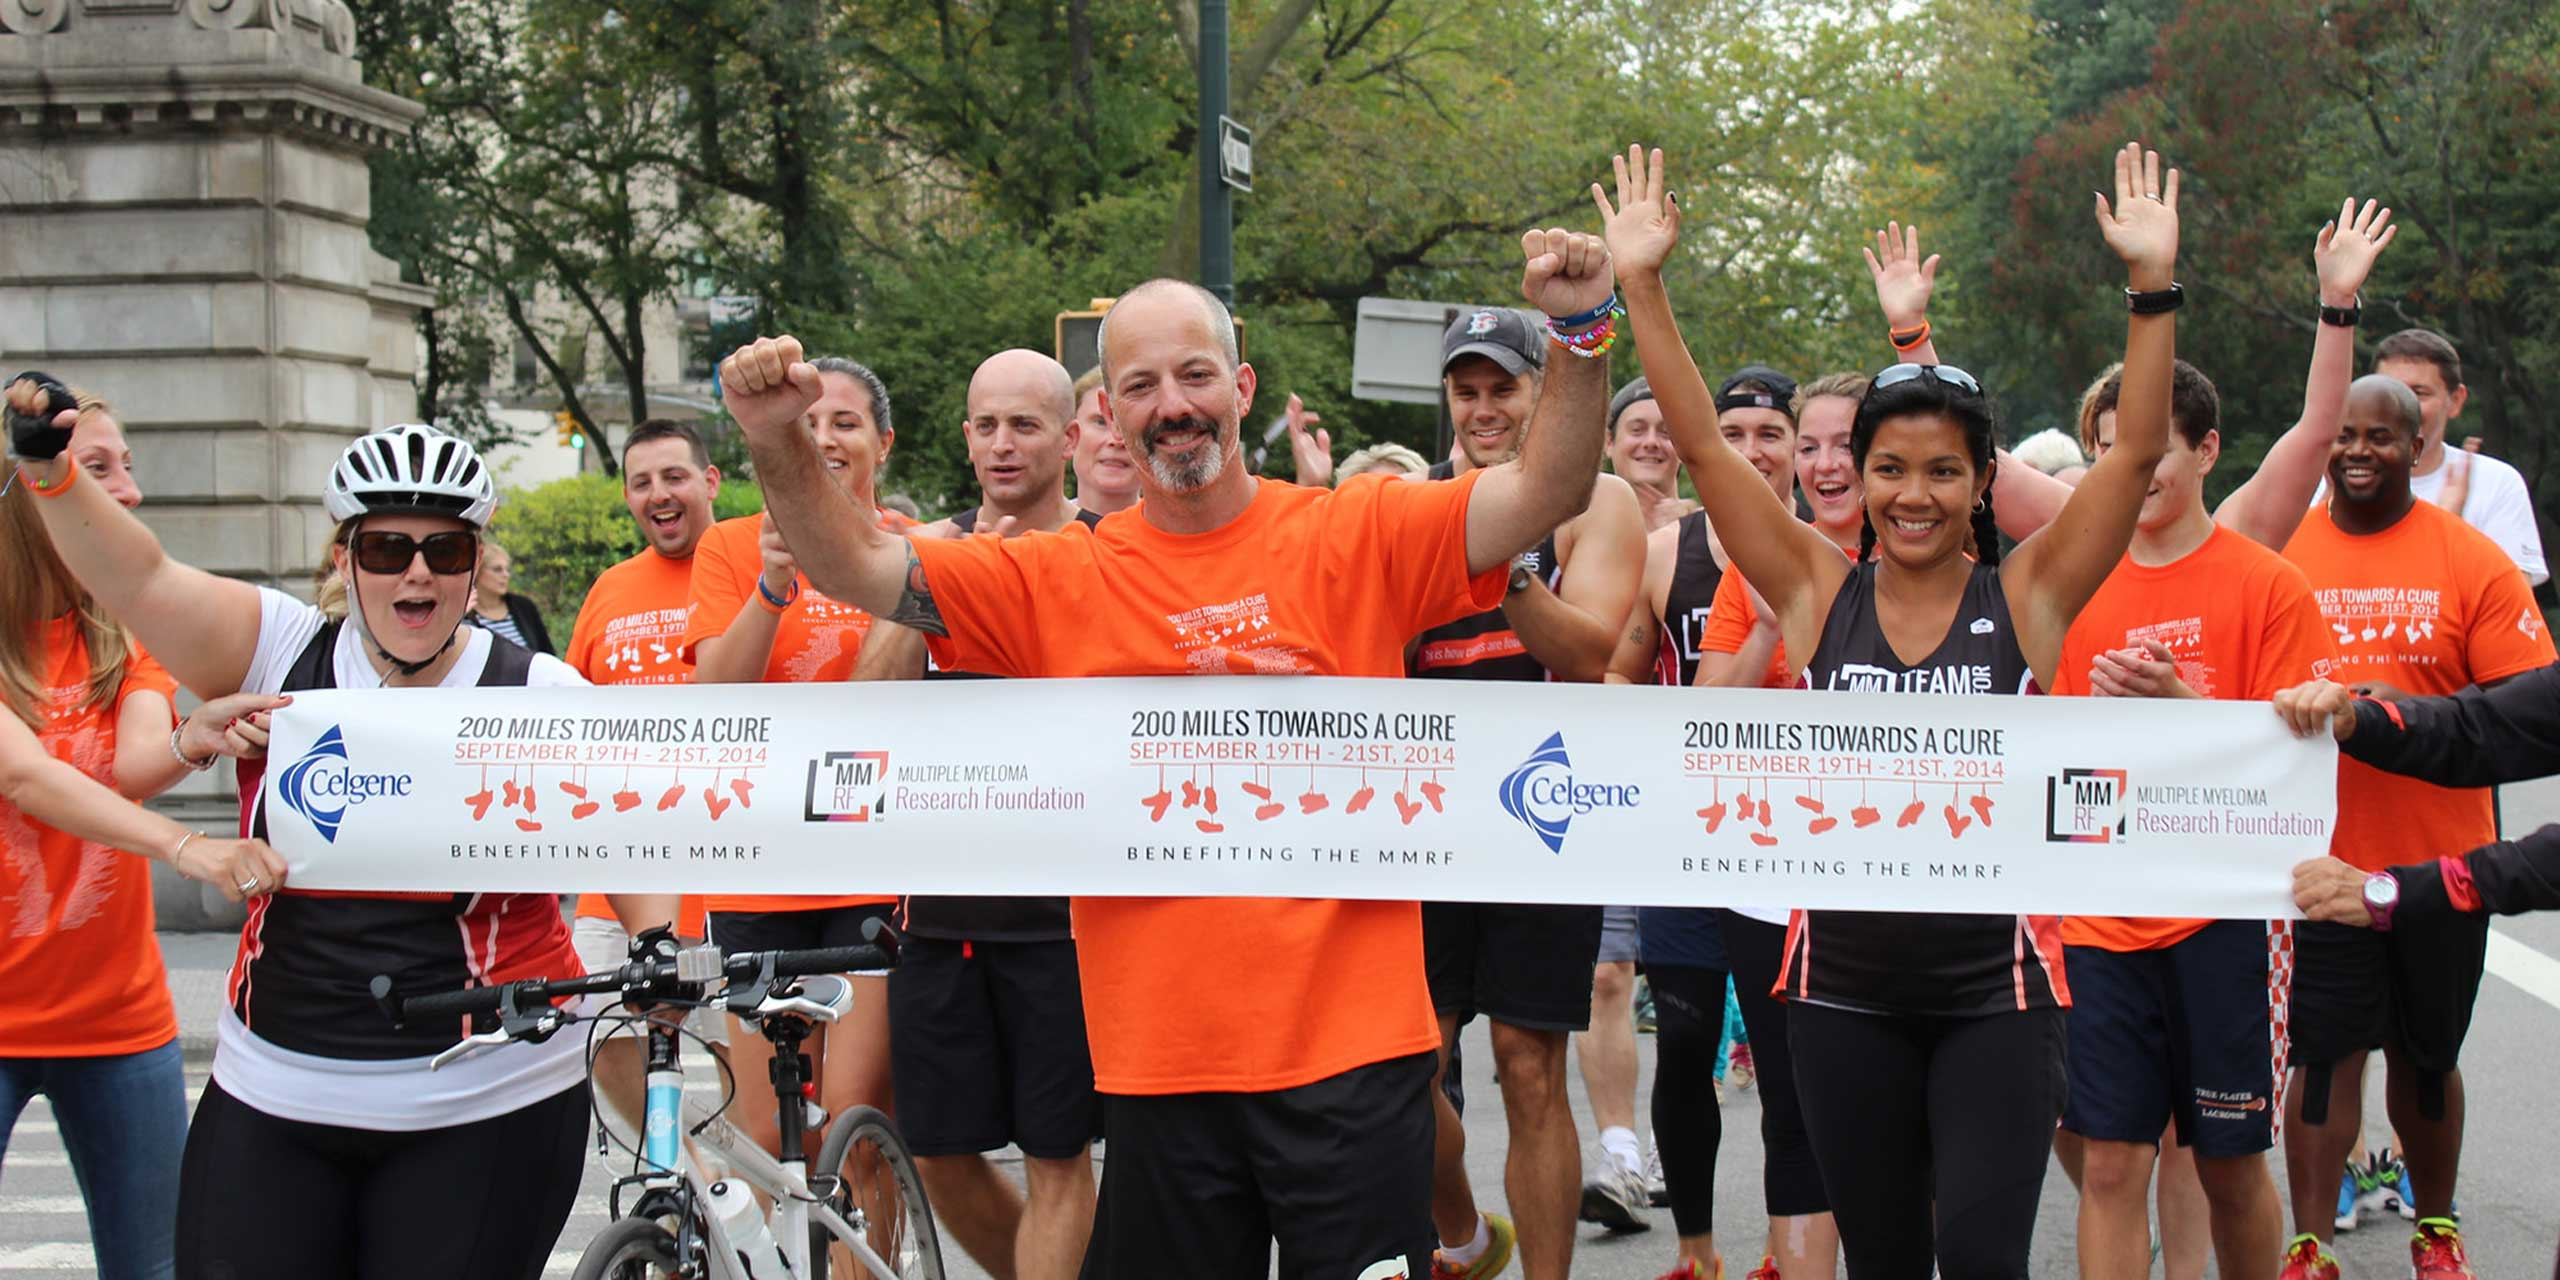 Marathoner, Eric Gelber célébrant